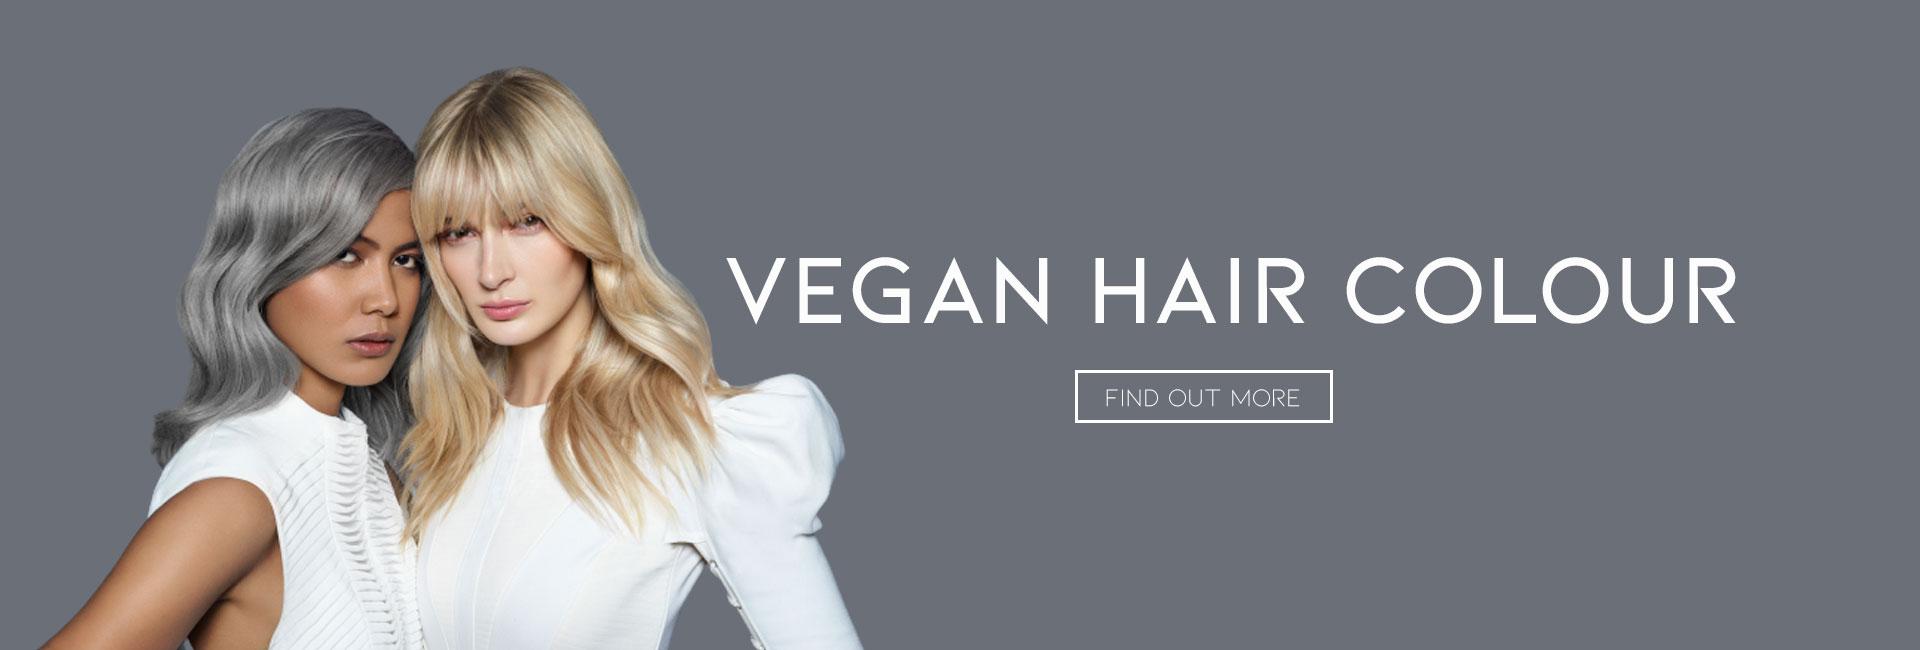 VEGAN HAIR COLOUR at melani richards hair and beauty salon in peterborough